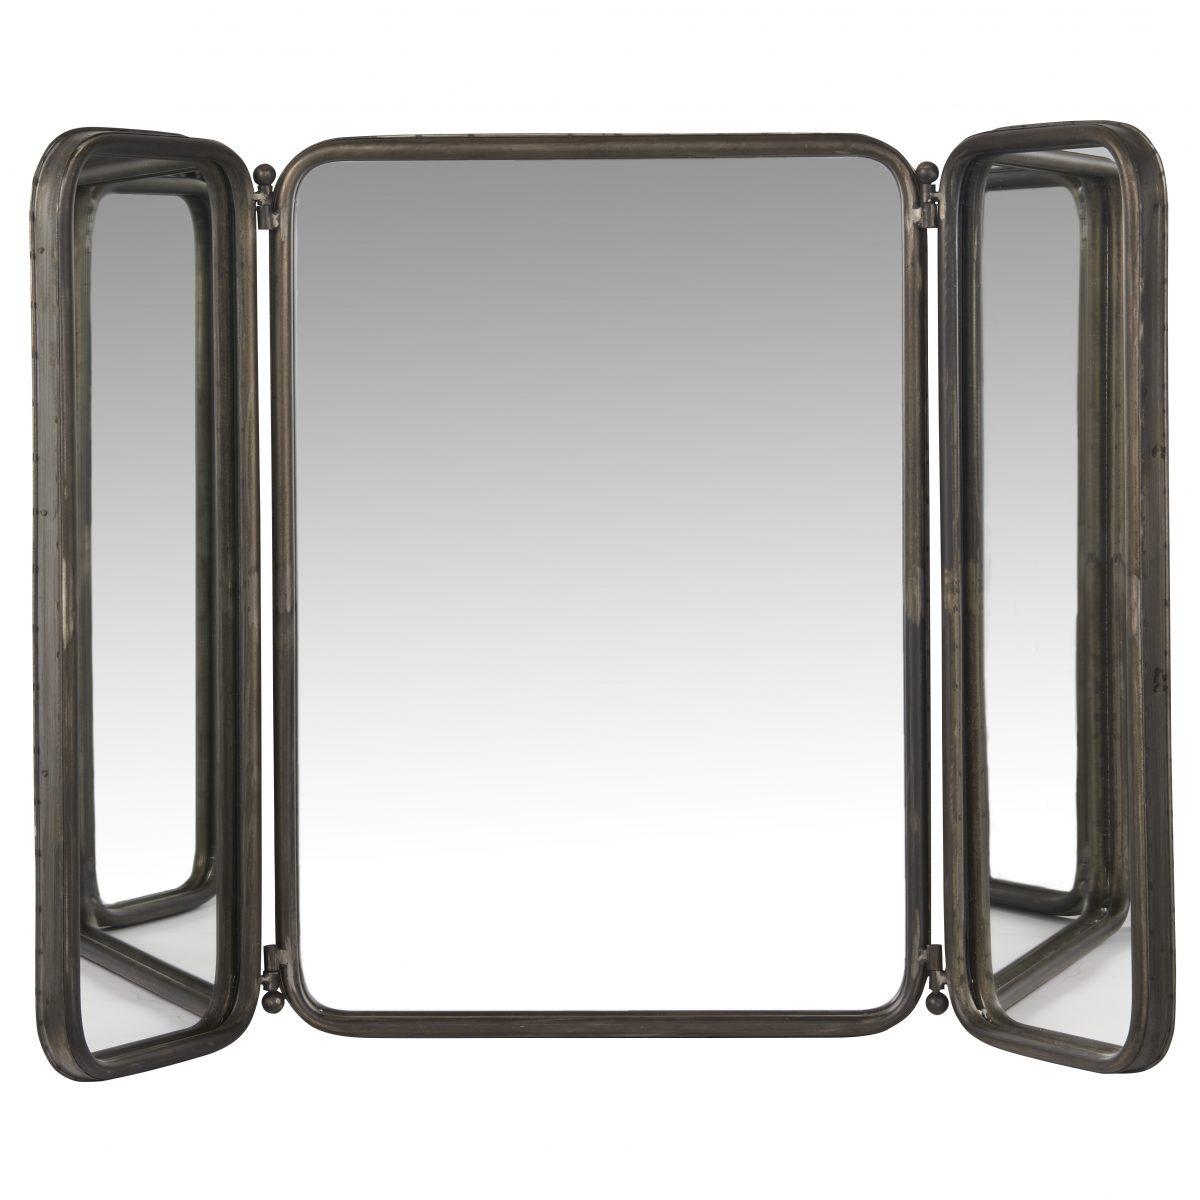 Rustic black rectangular 3 panel folding wall hanging mirror for Miroir 3 pans